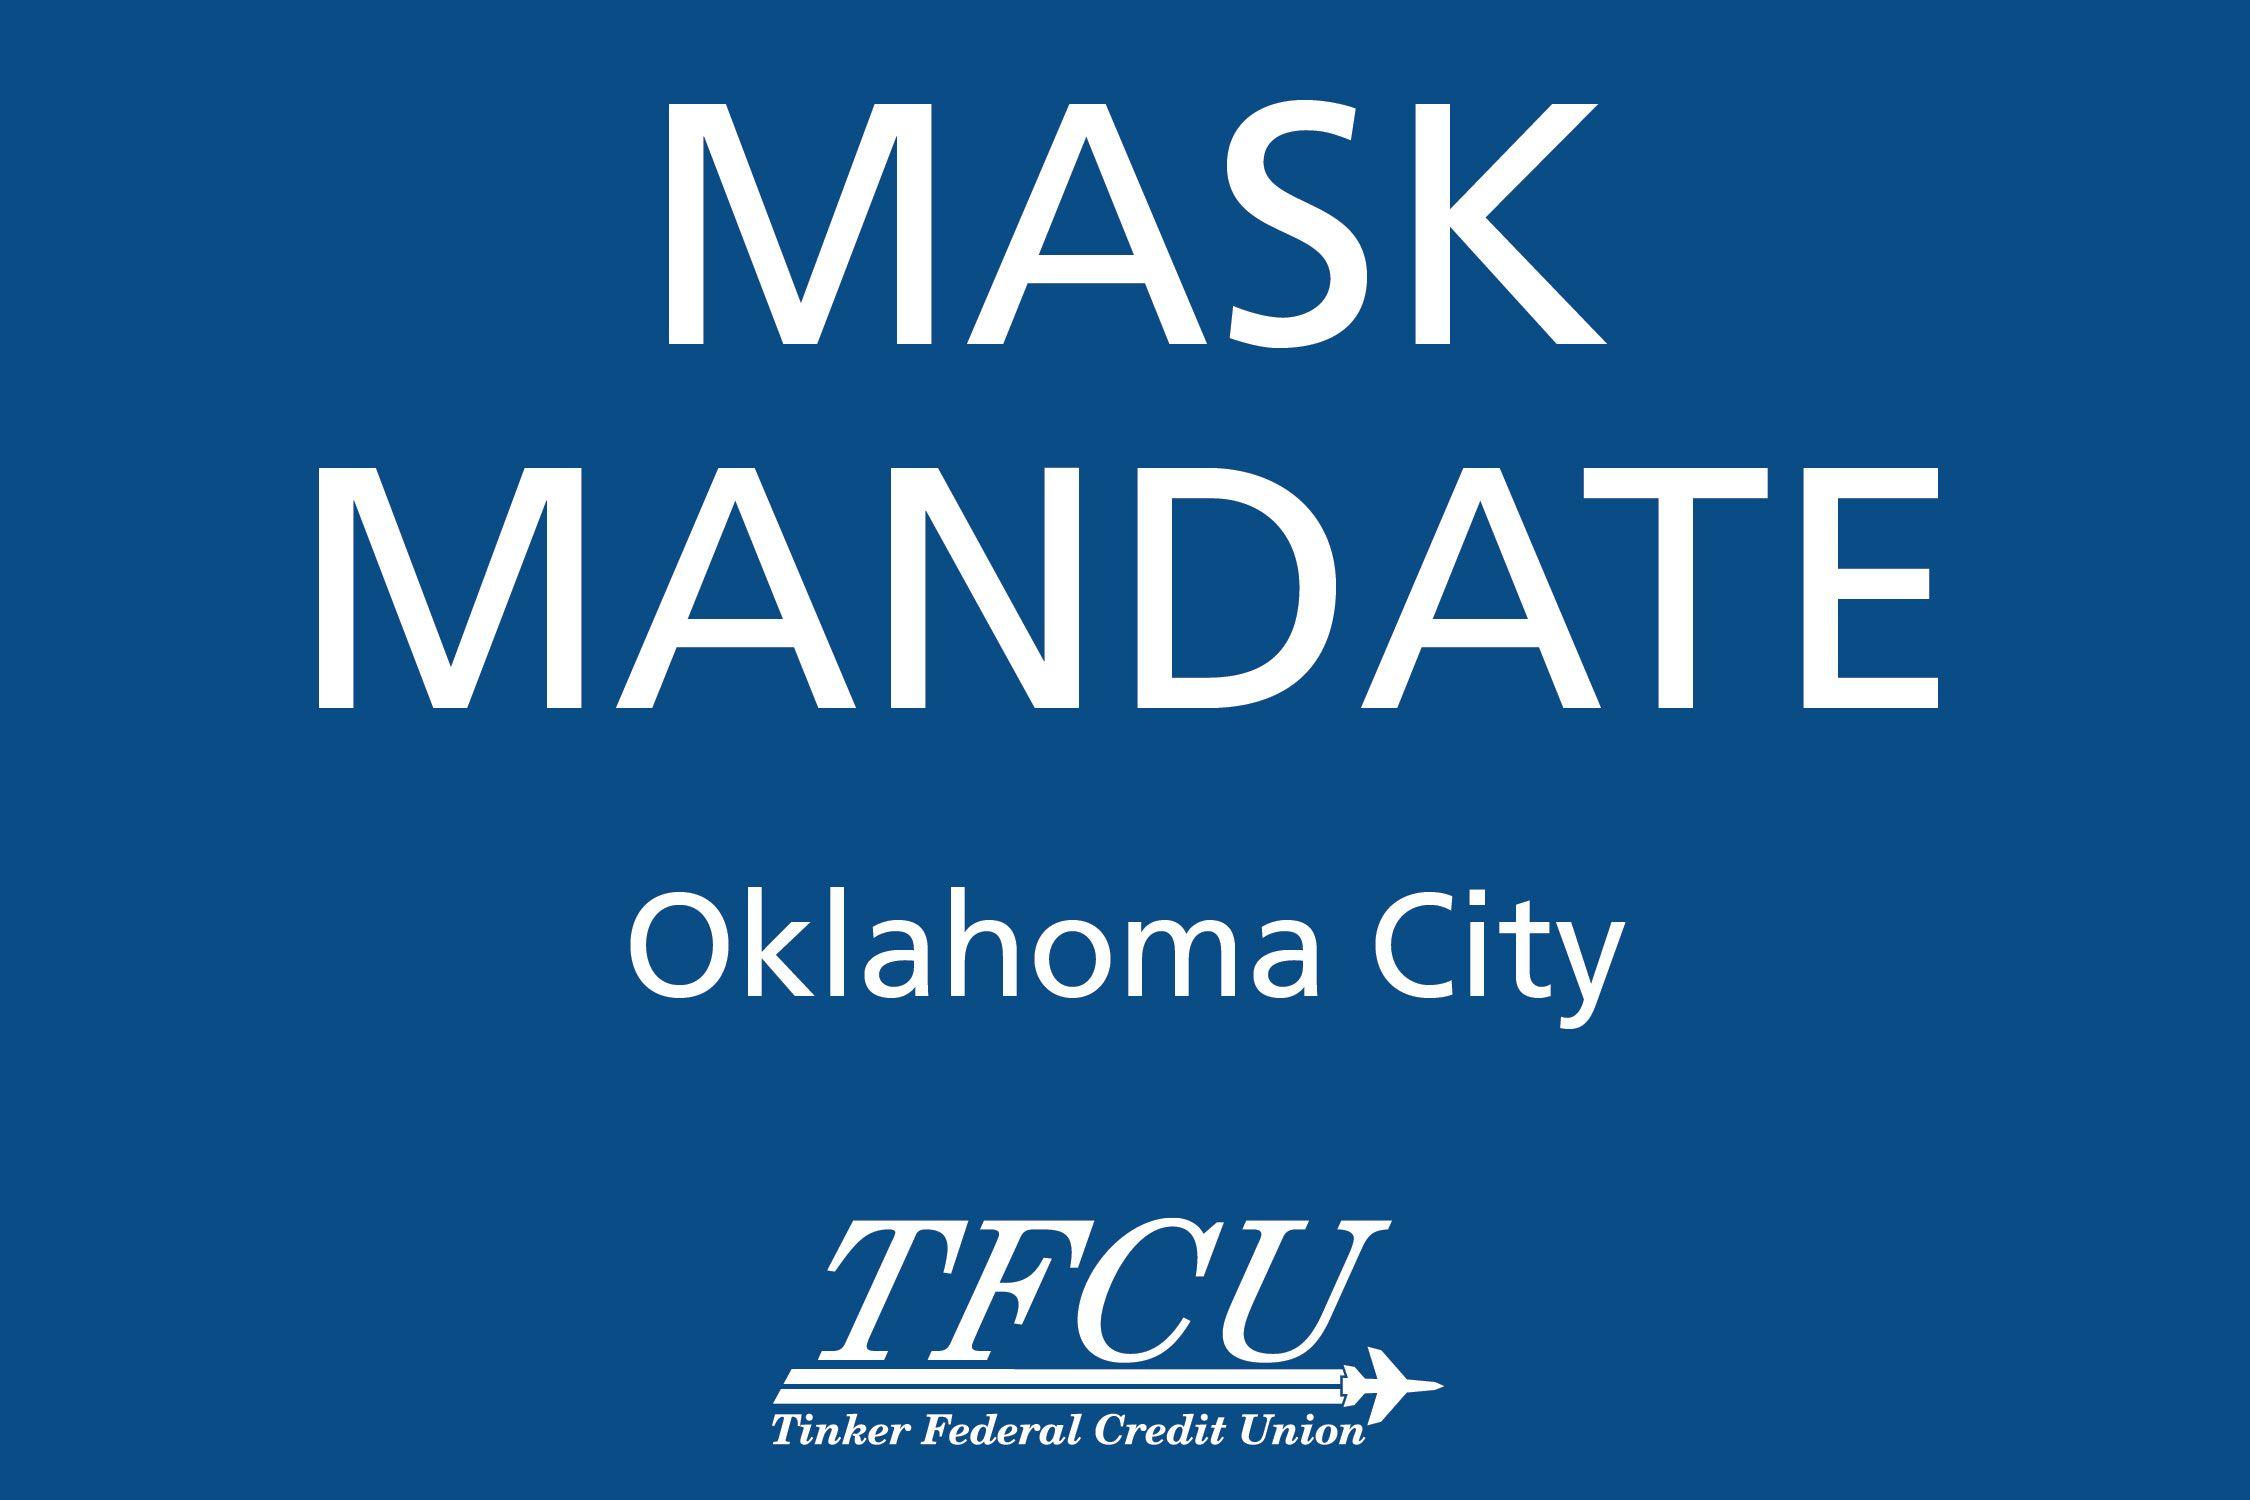 Mask Mandate OKC